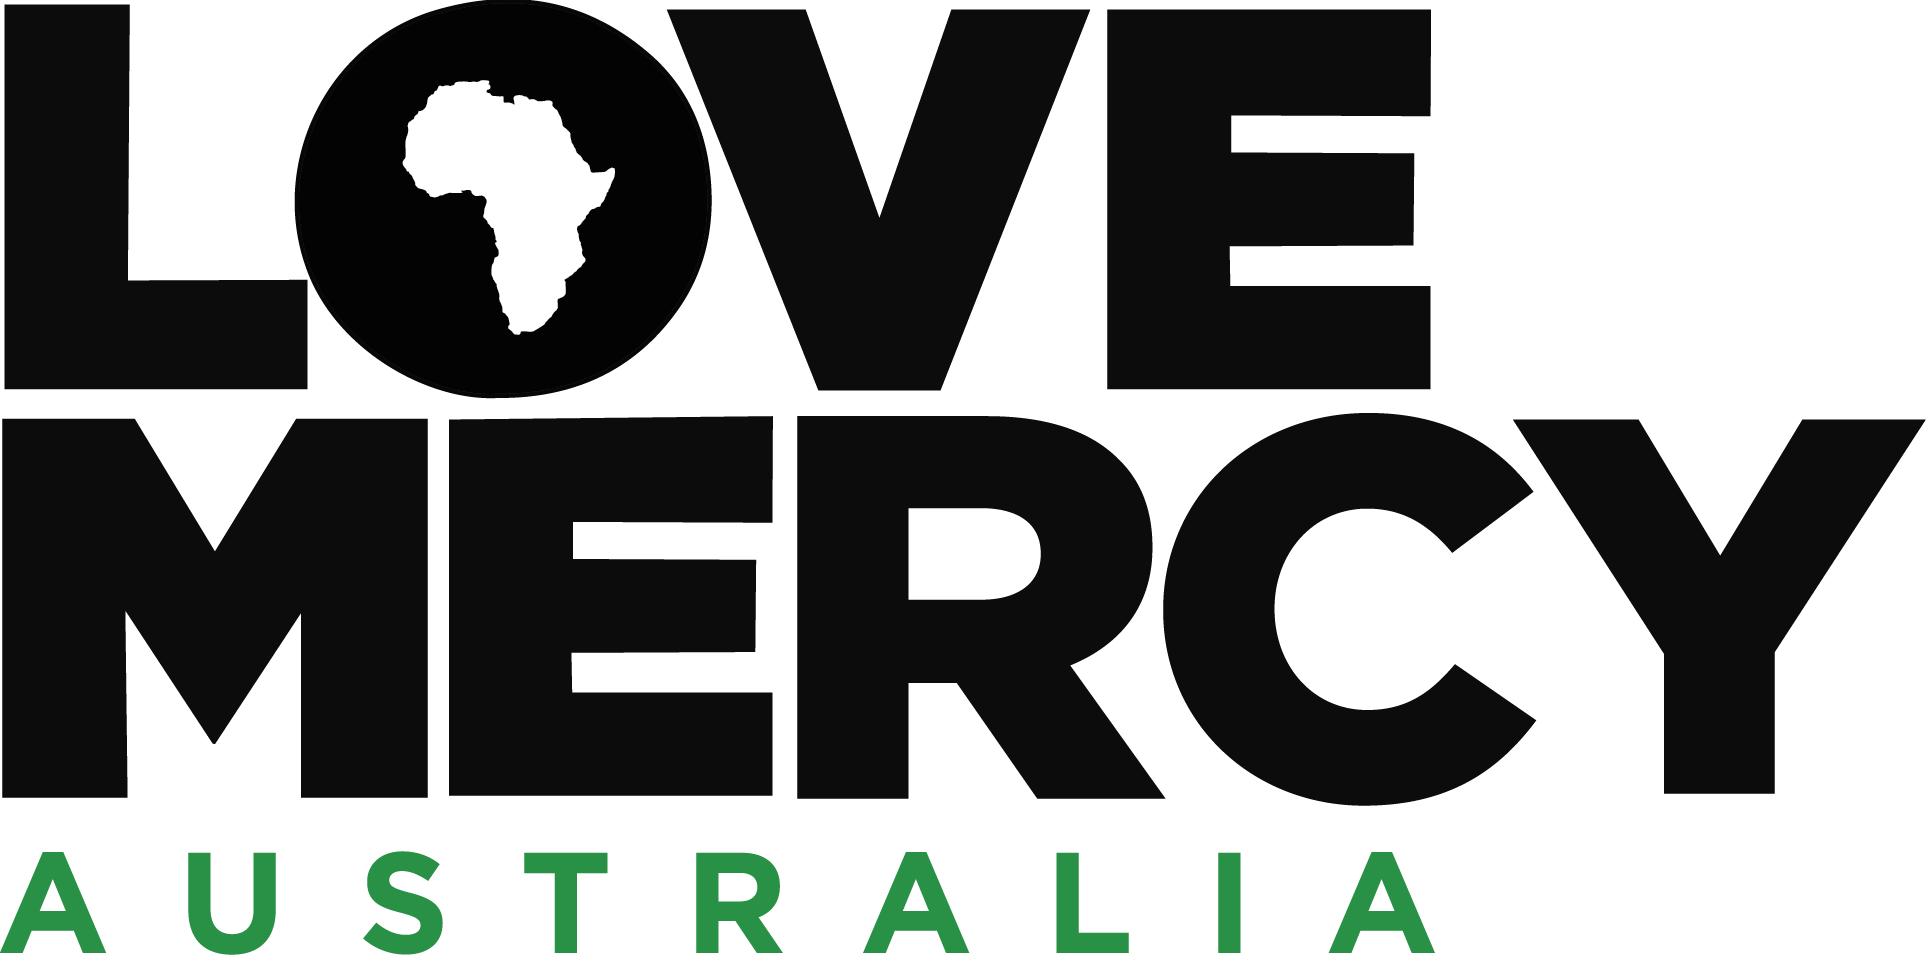 africa-green-logo.png